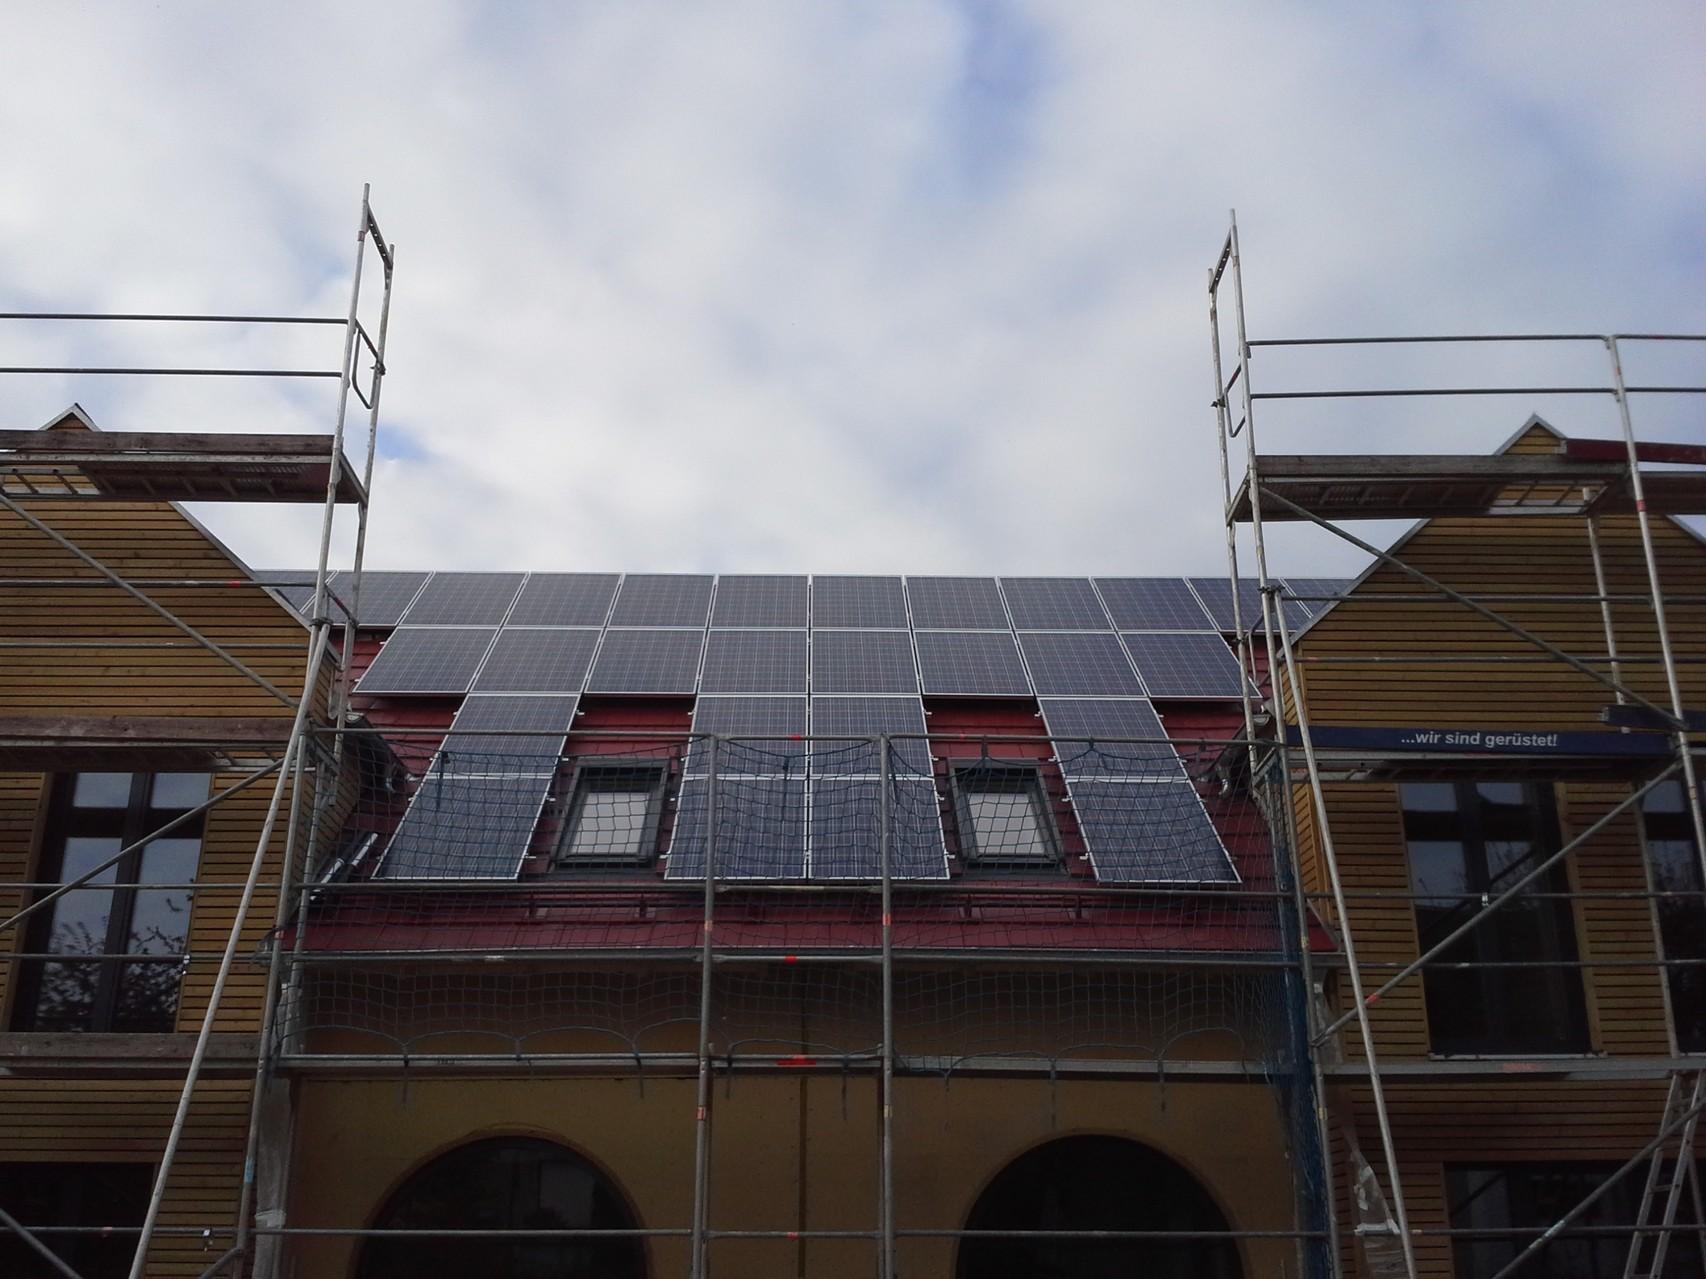 12,5 kWp in 93105 Tegerheim Solarwatt Glas/Glas Modul